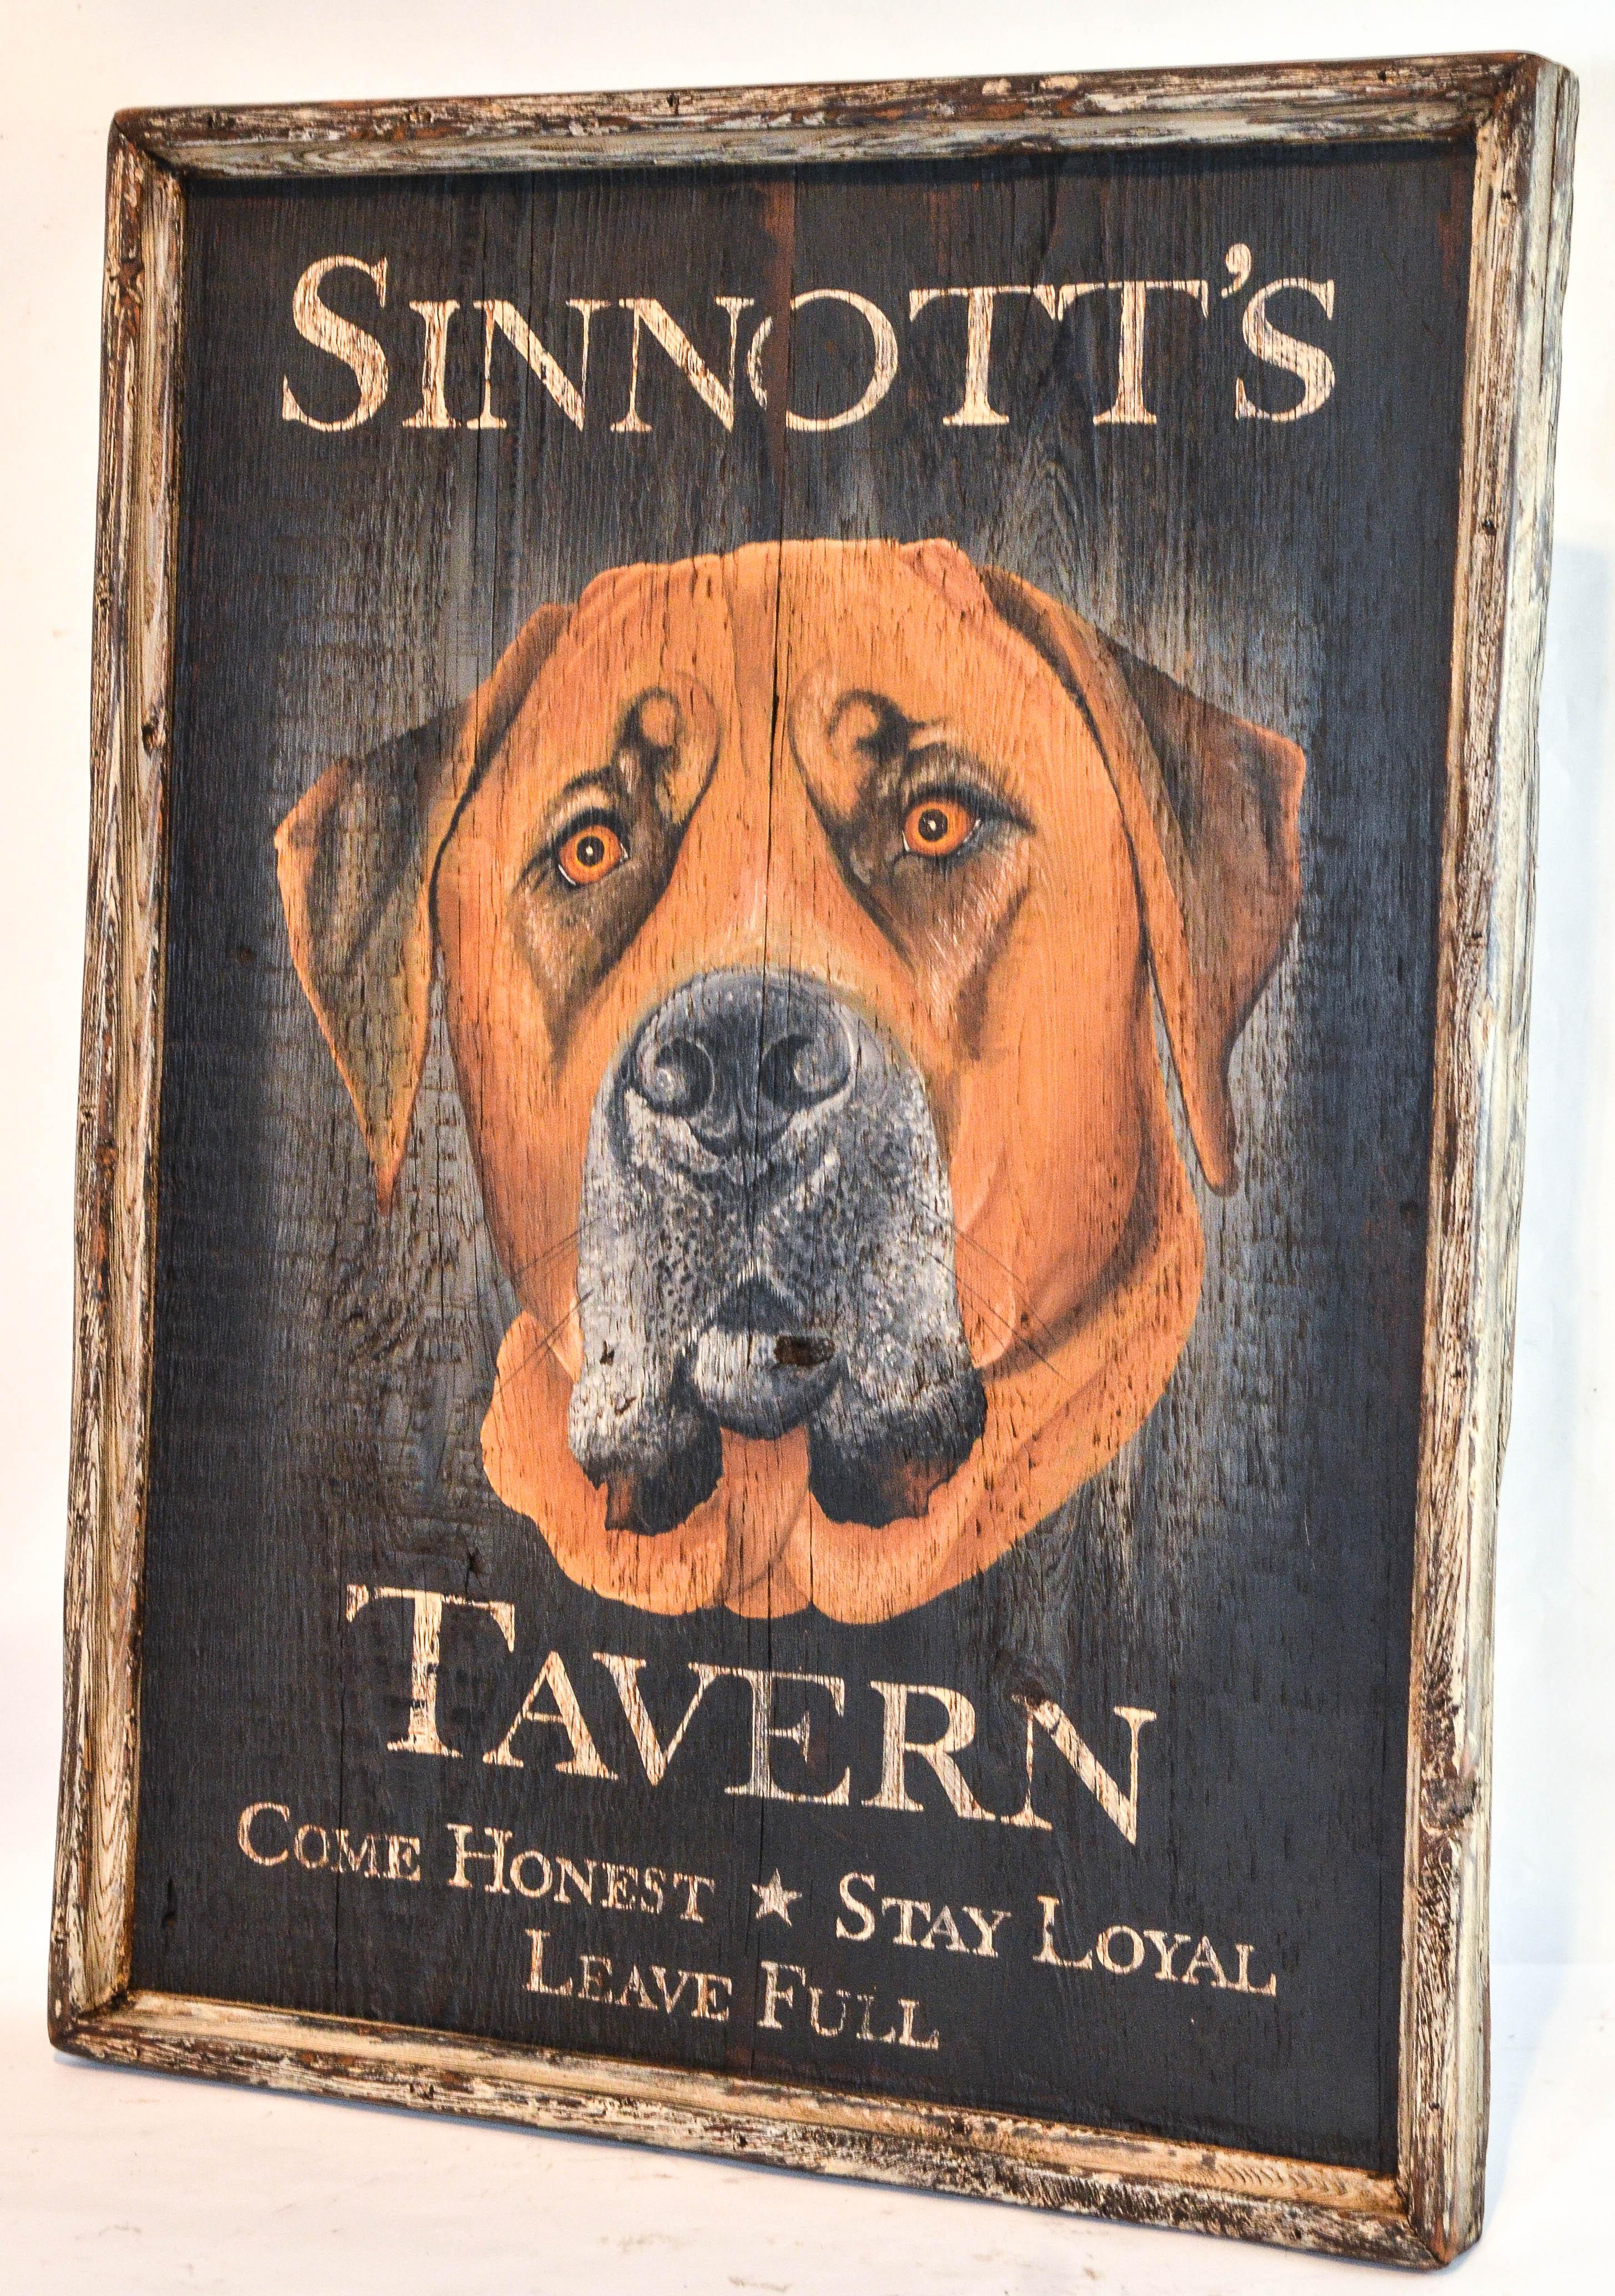 Sinnott's Tavern